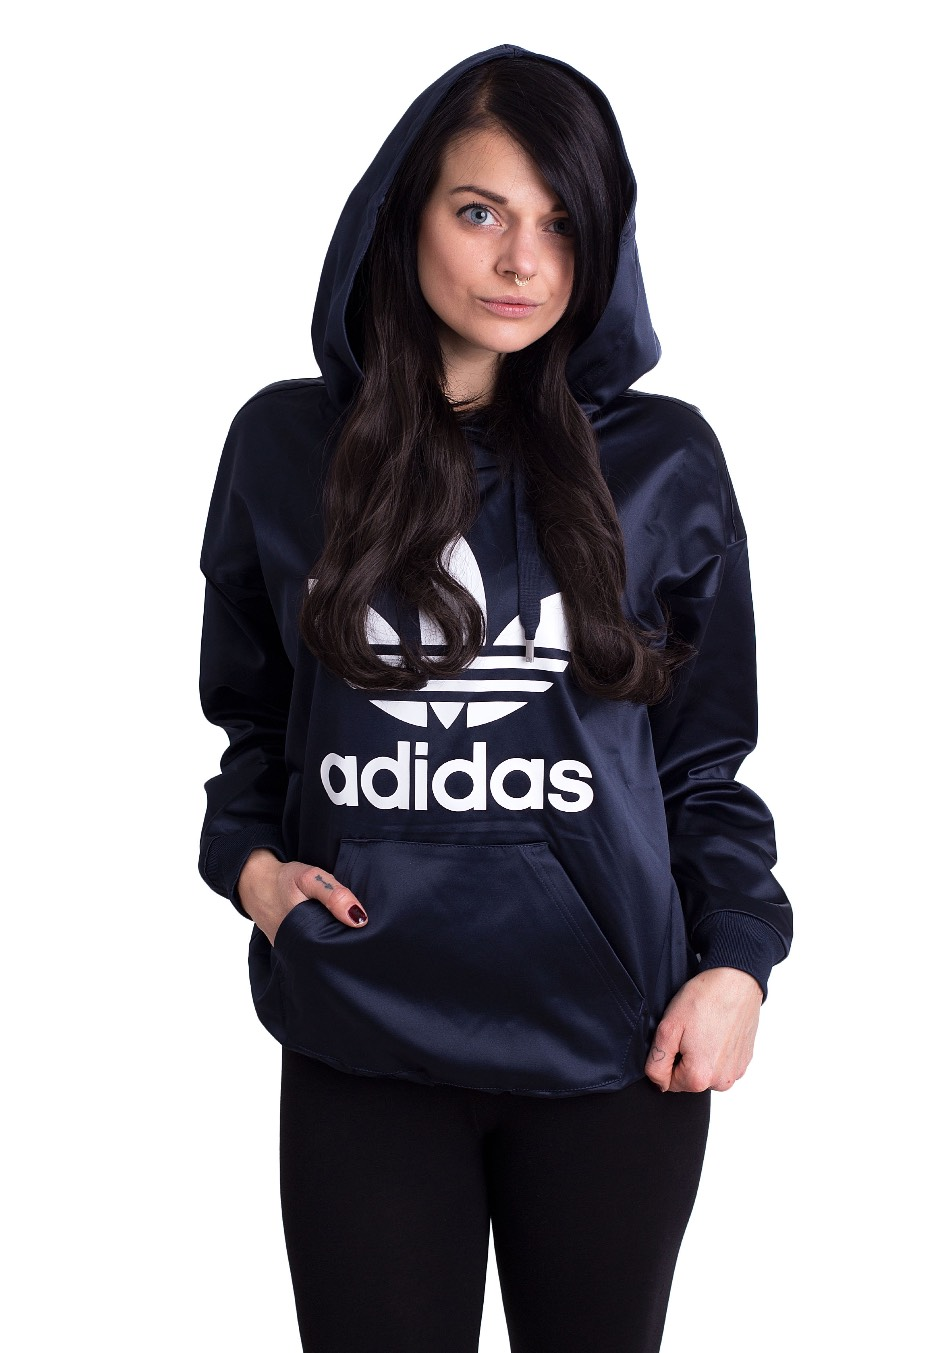 aab6ccdb0011 Adidas - Trefoil Legend Ink - Hoodie - Streetwear Shop - Impericon.com US